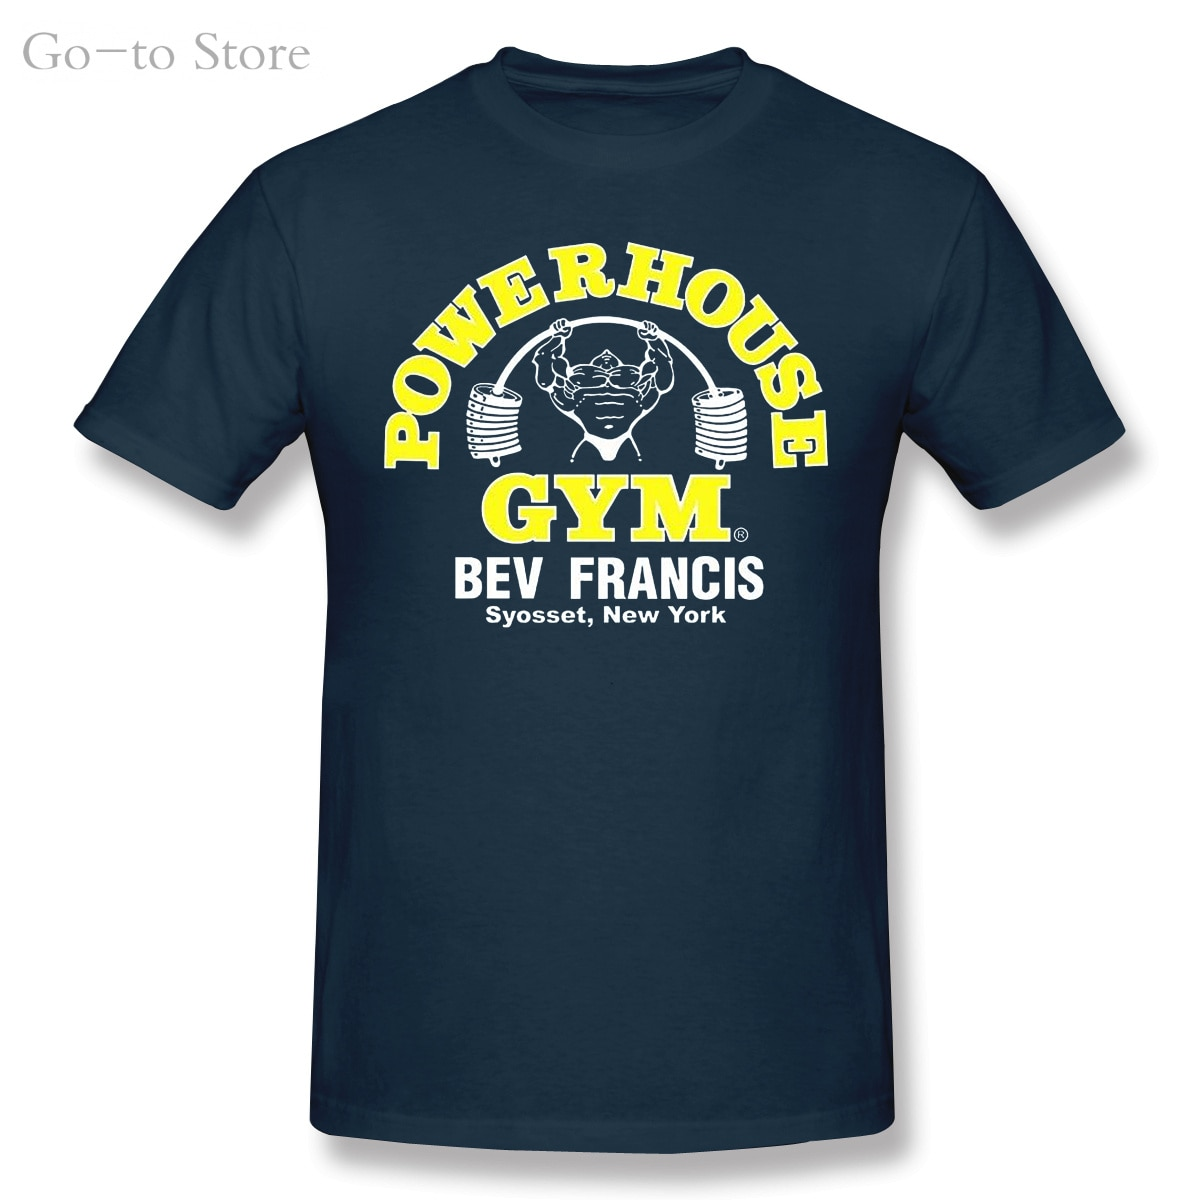 Tops T Shirt Men Powerhouse Gym Summer Harajuku Geek Cotton Male Tshirt Fashion T-shirt